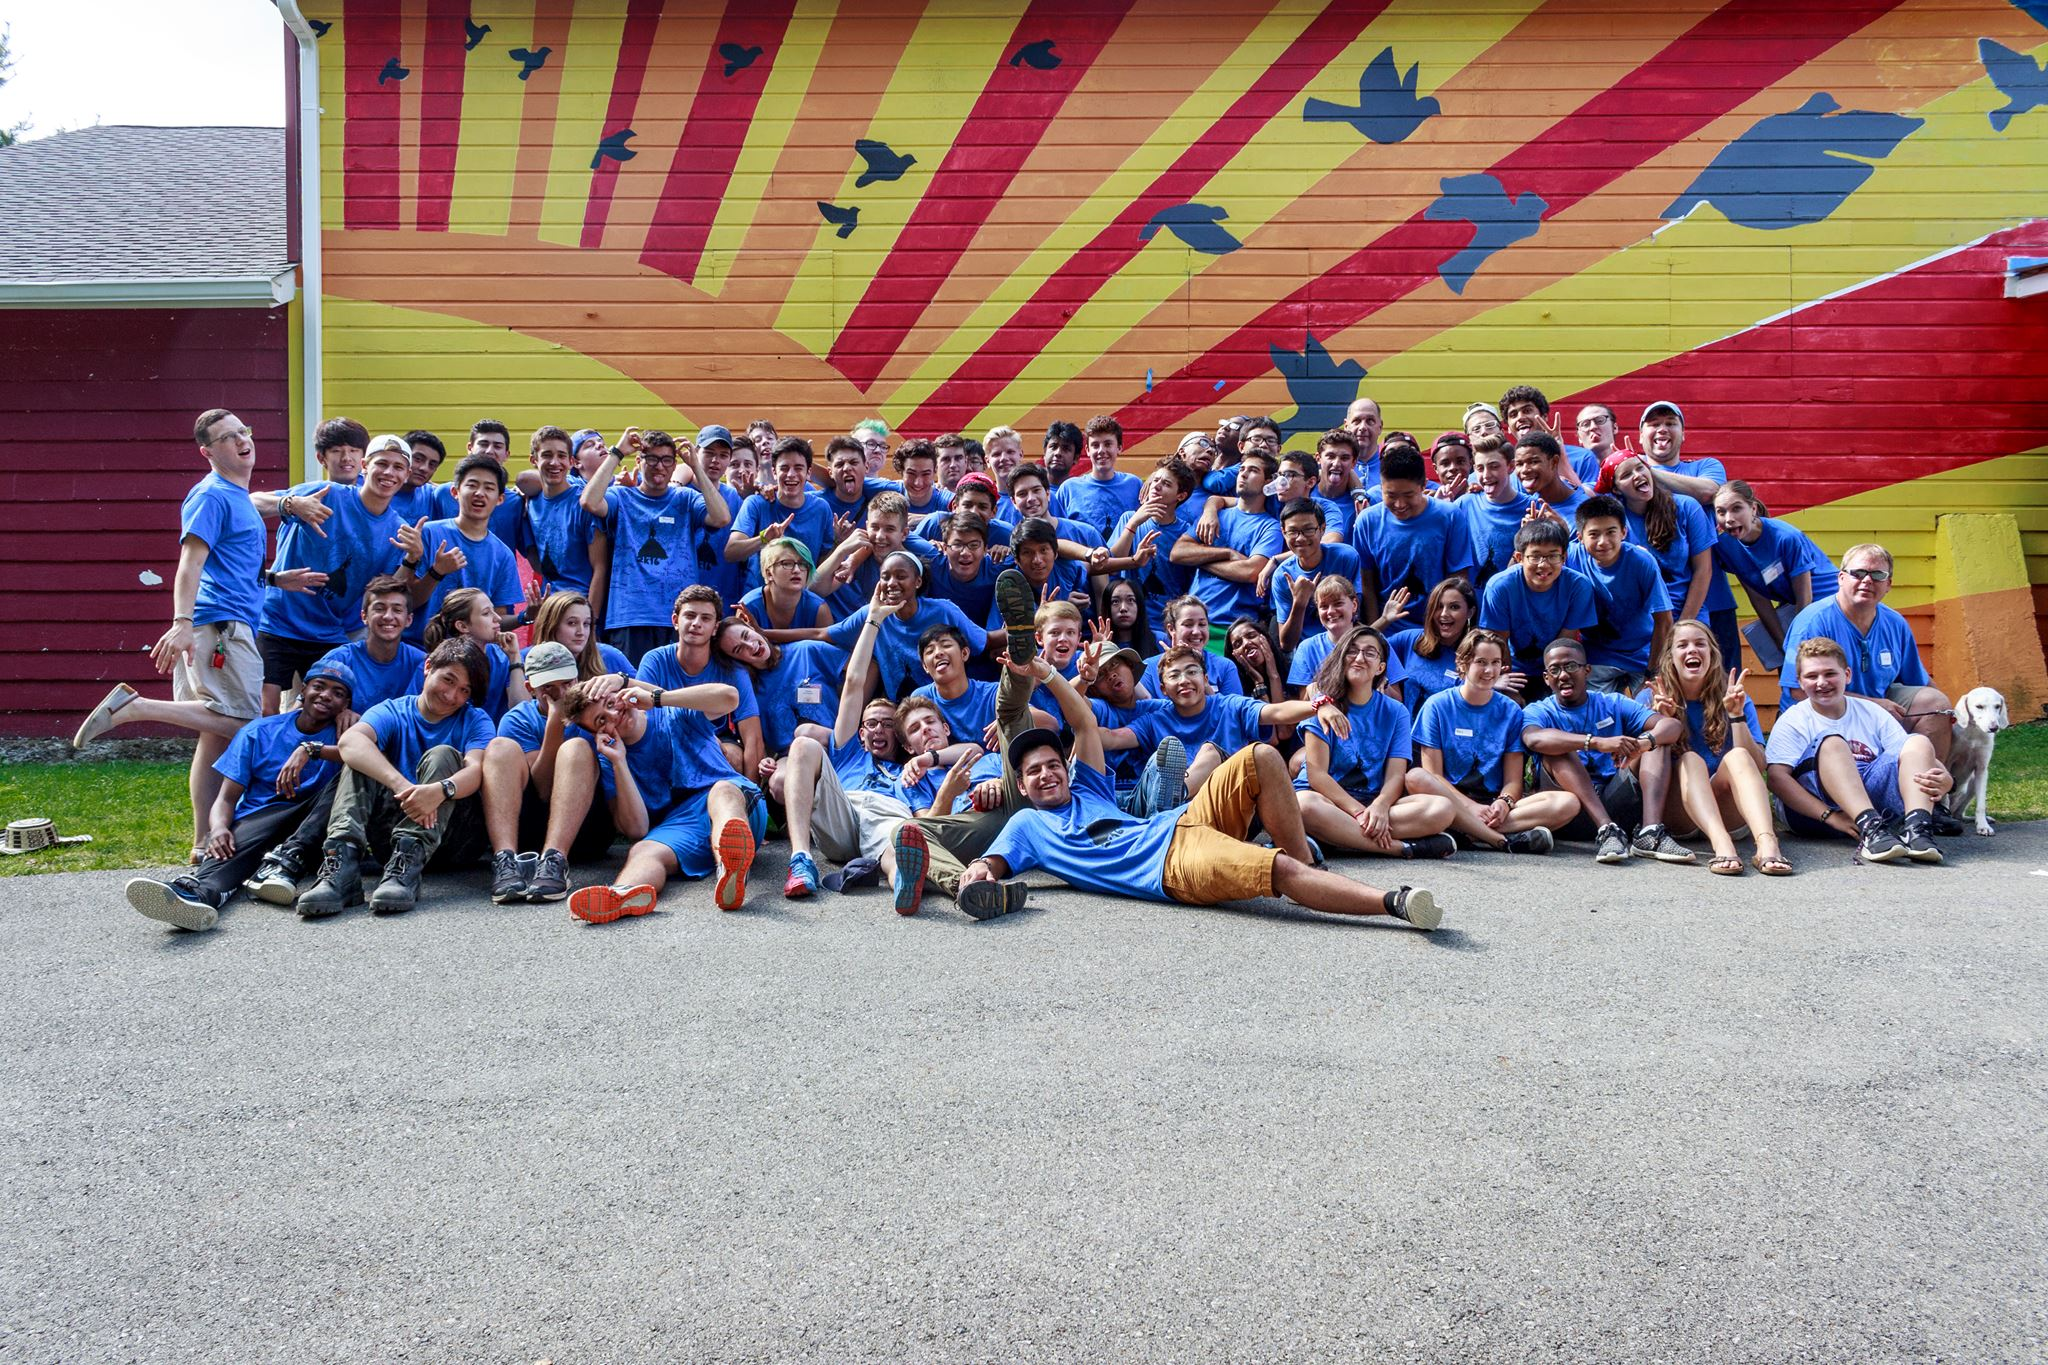 2016 Boys' Session